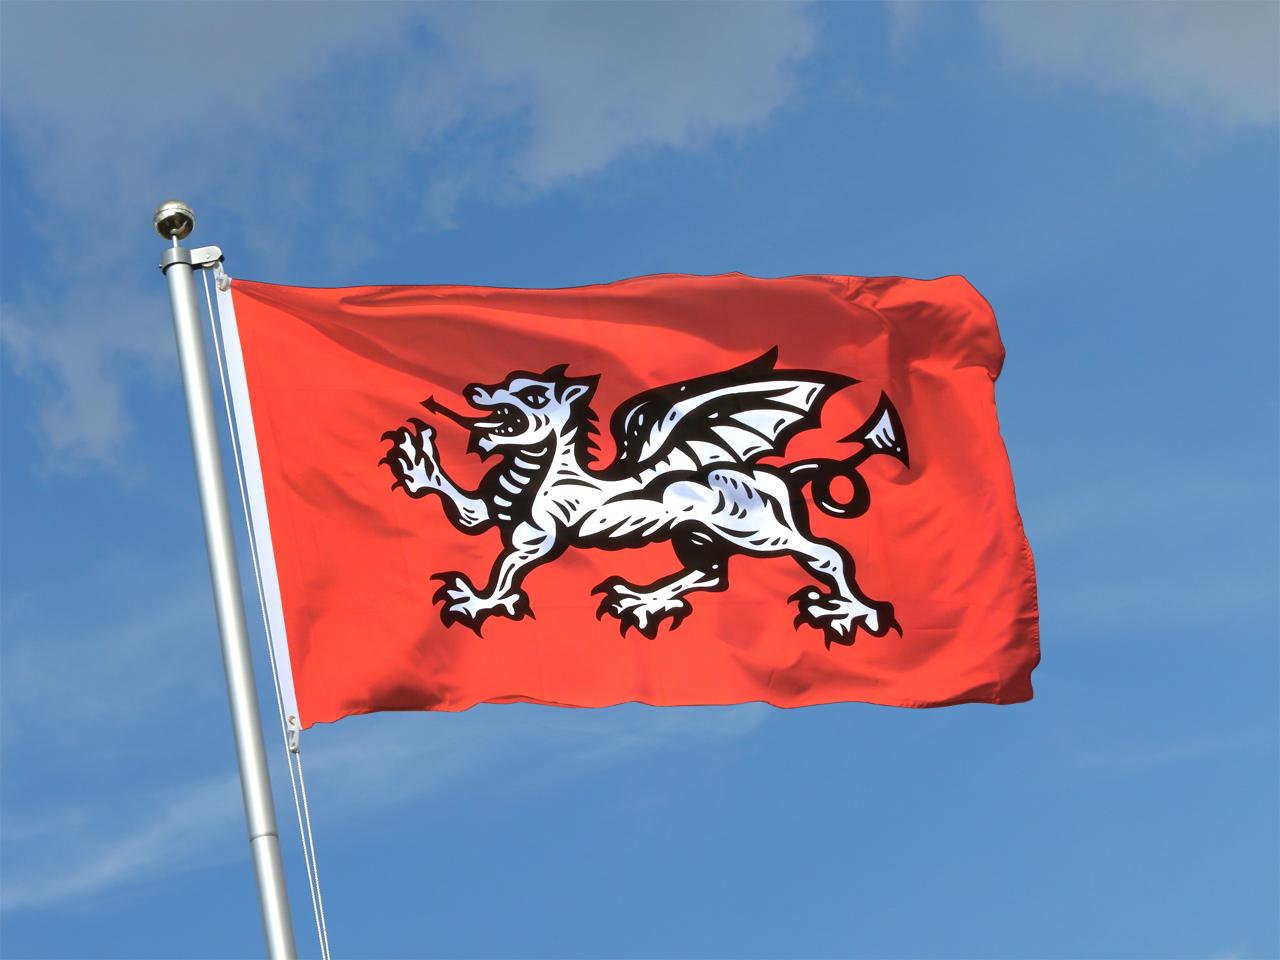 Drapeau Angleterre Avec Dragon